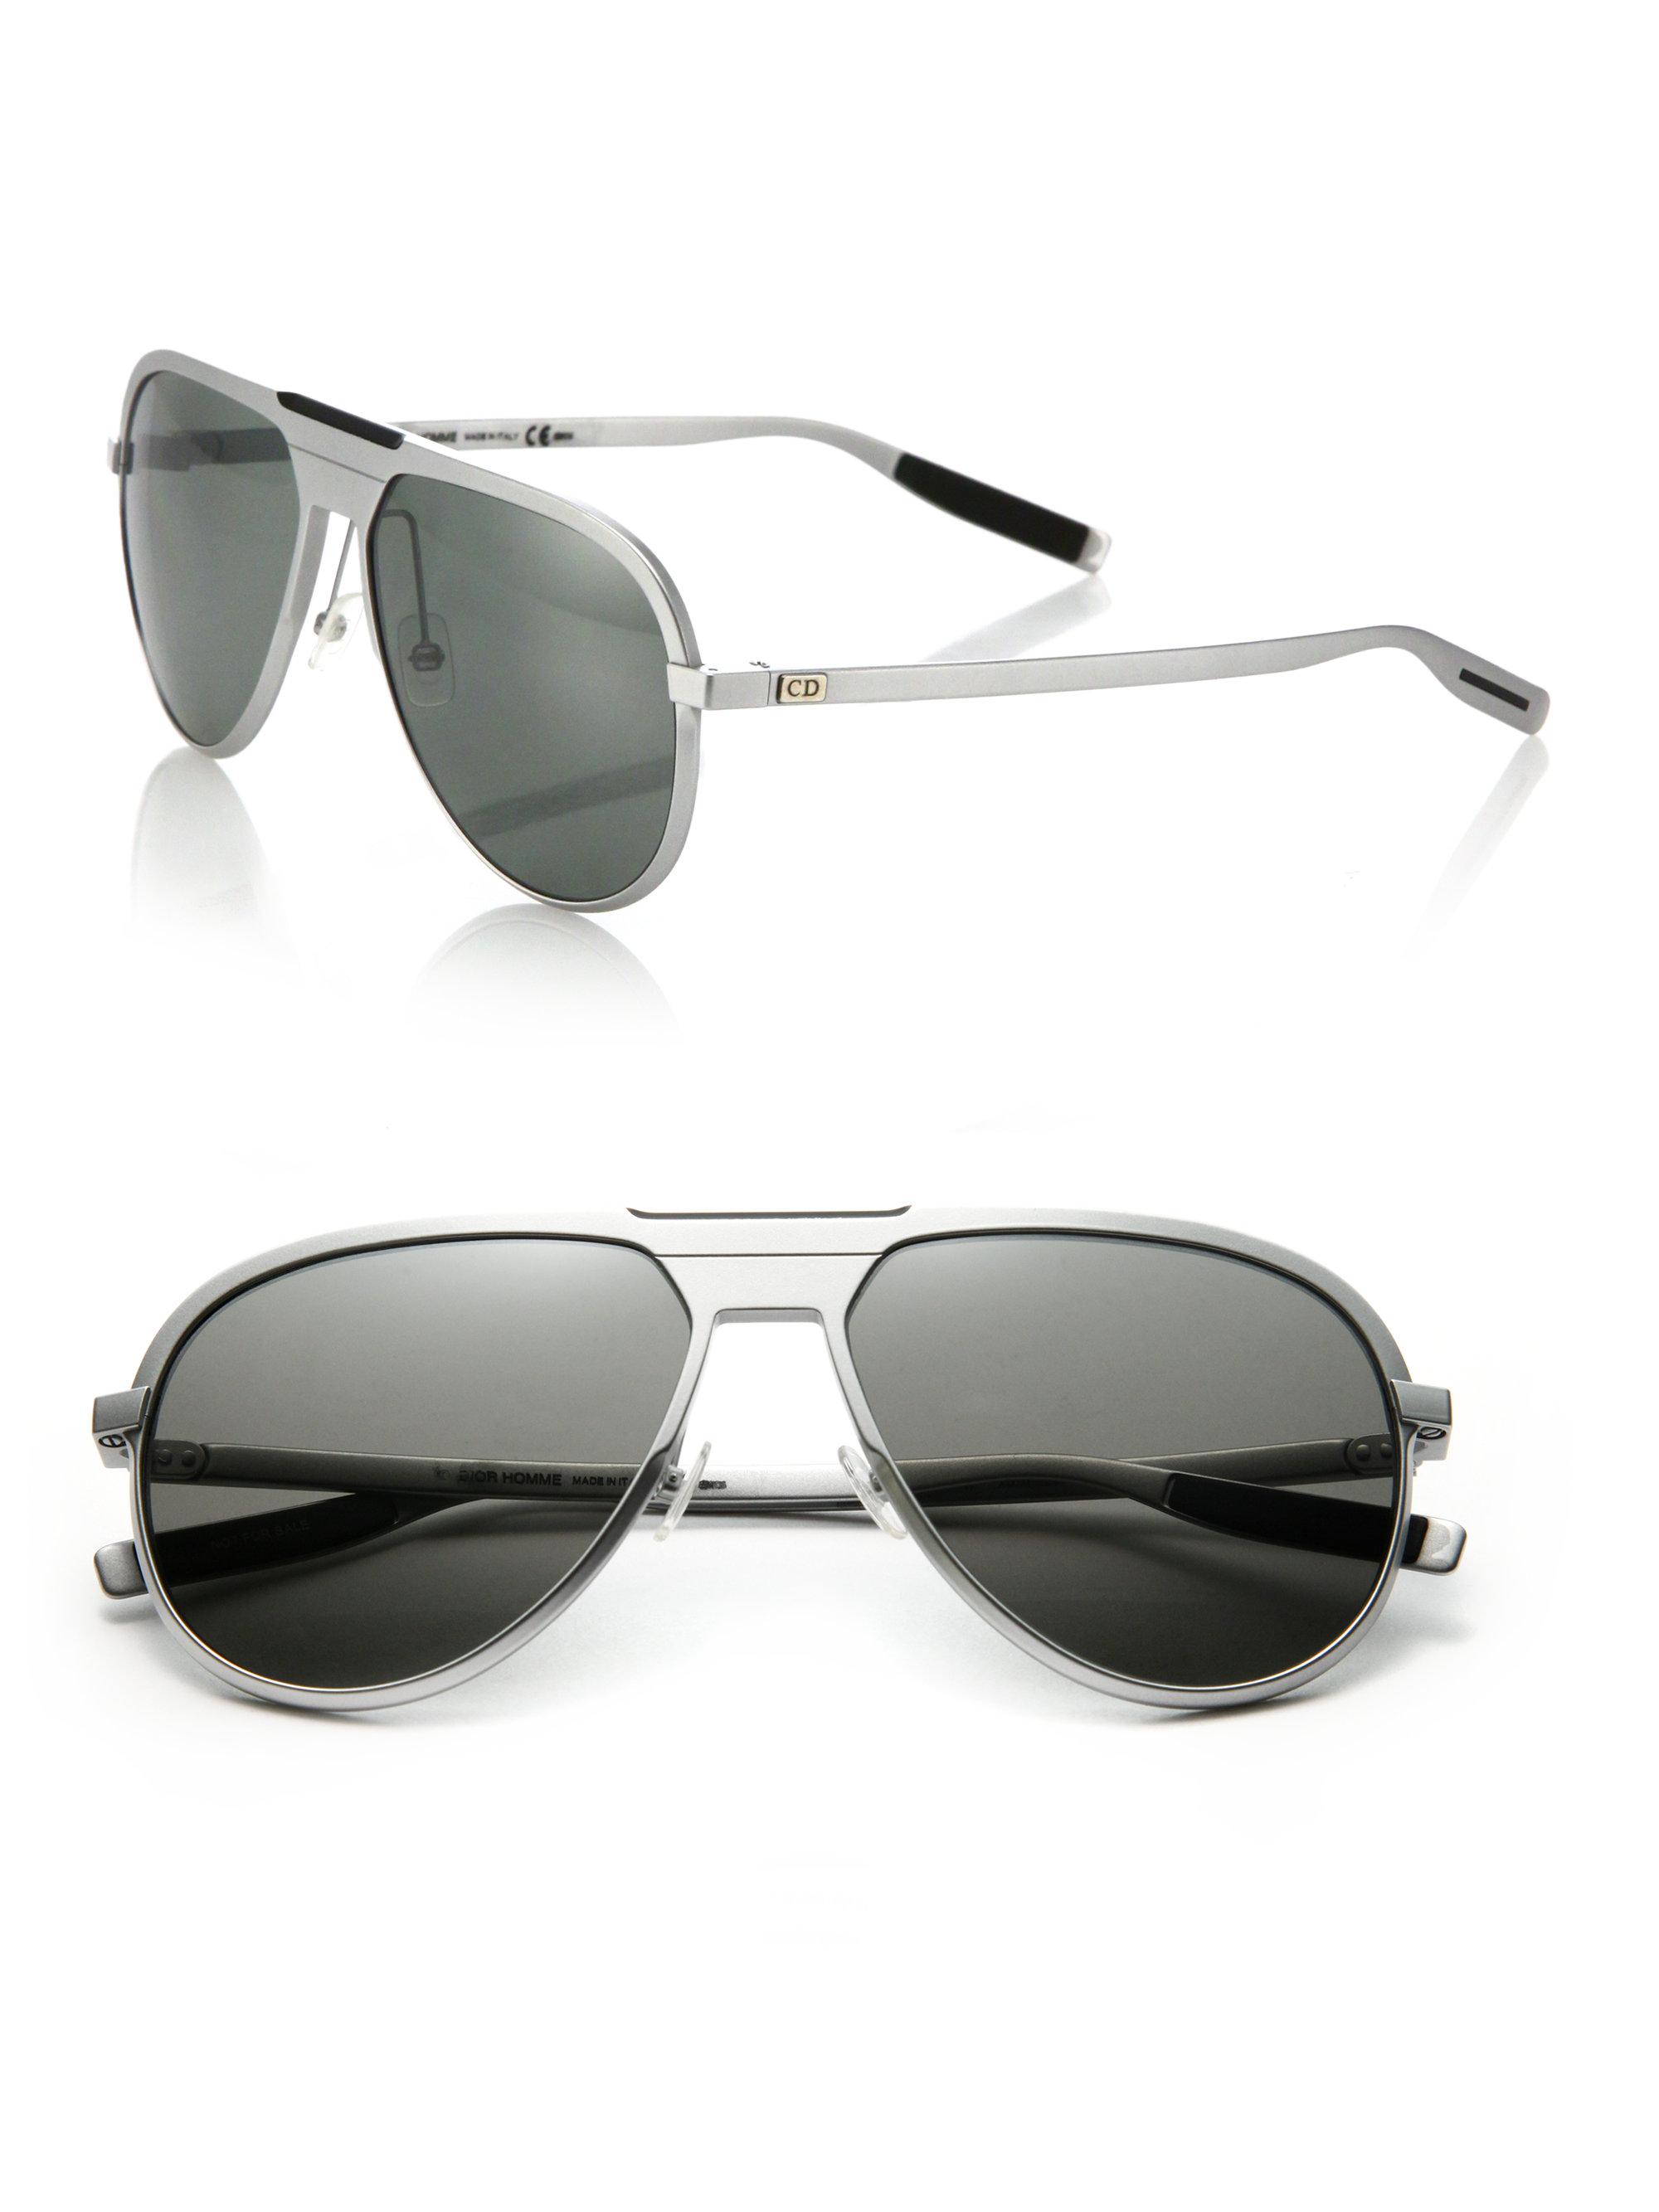 722255fb9cb3 Dior Split Sunglasses Amazon